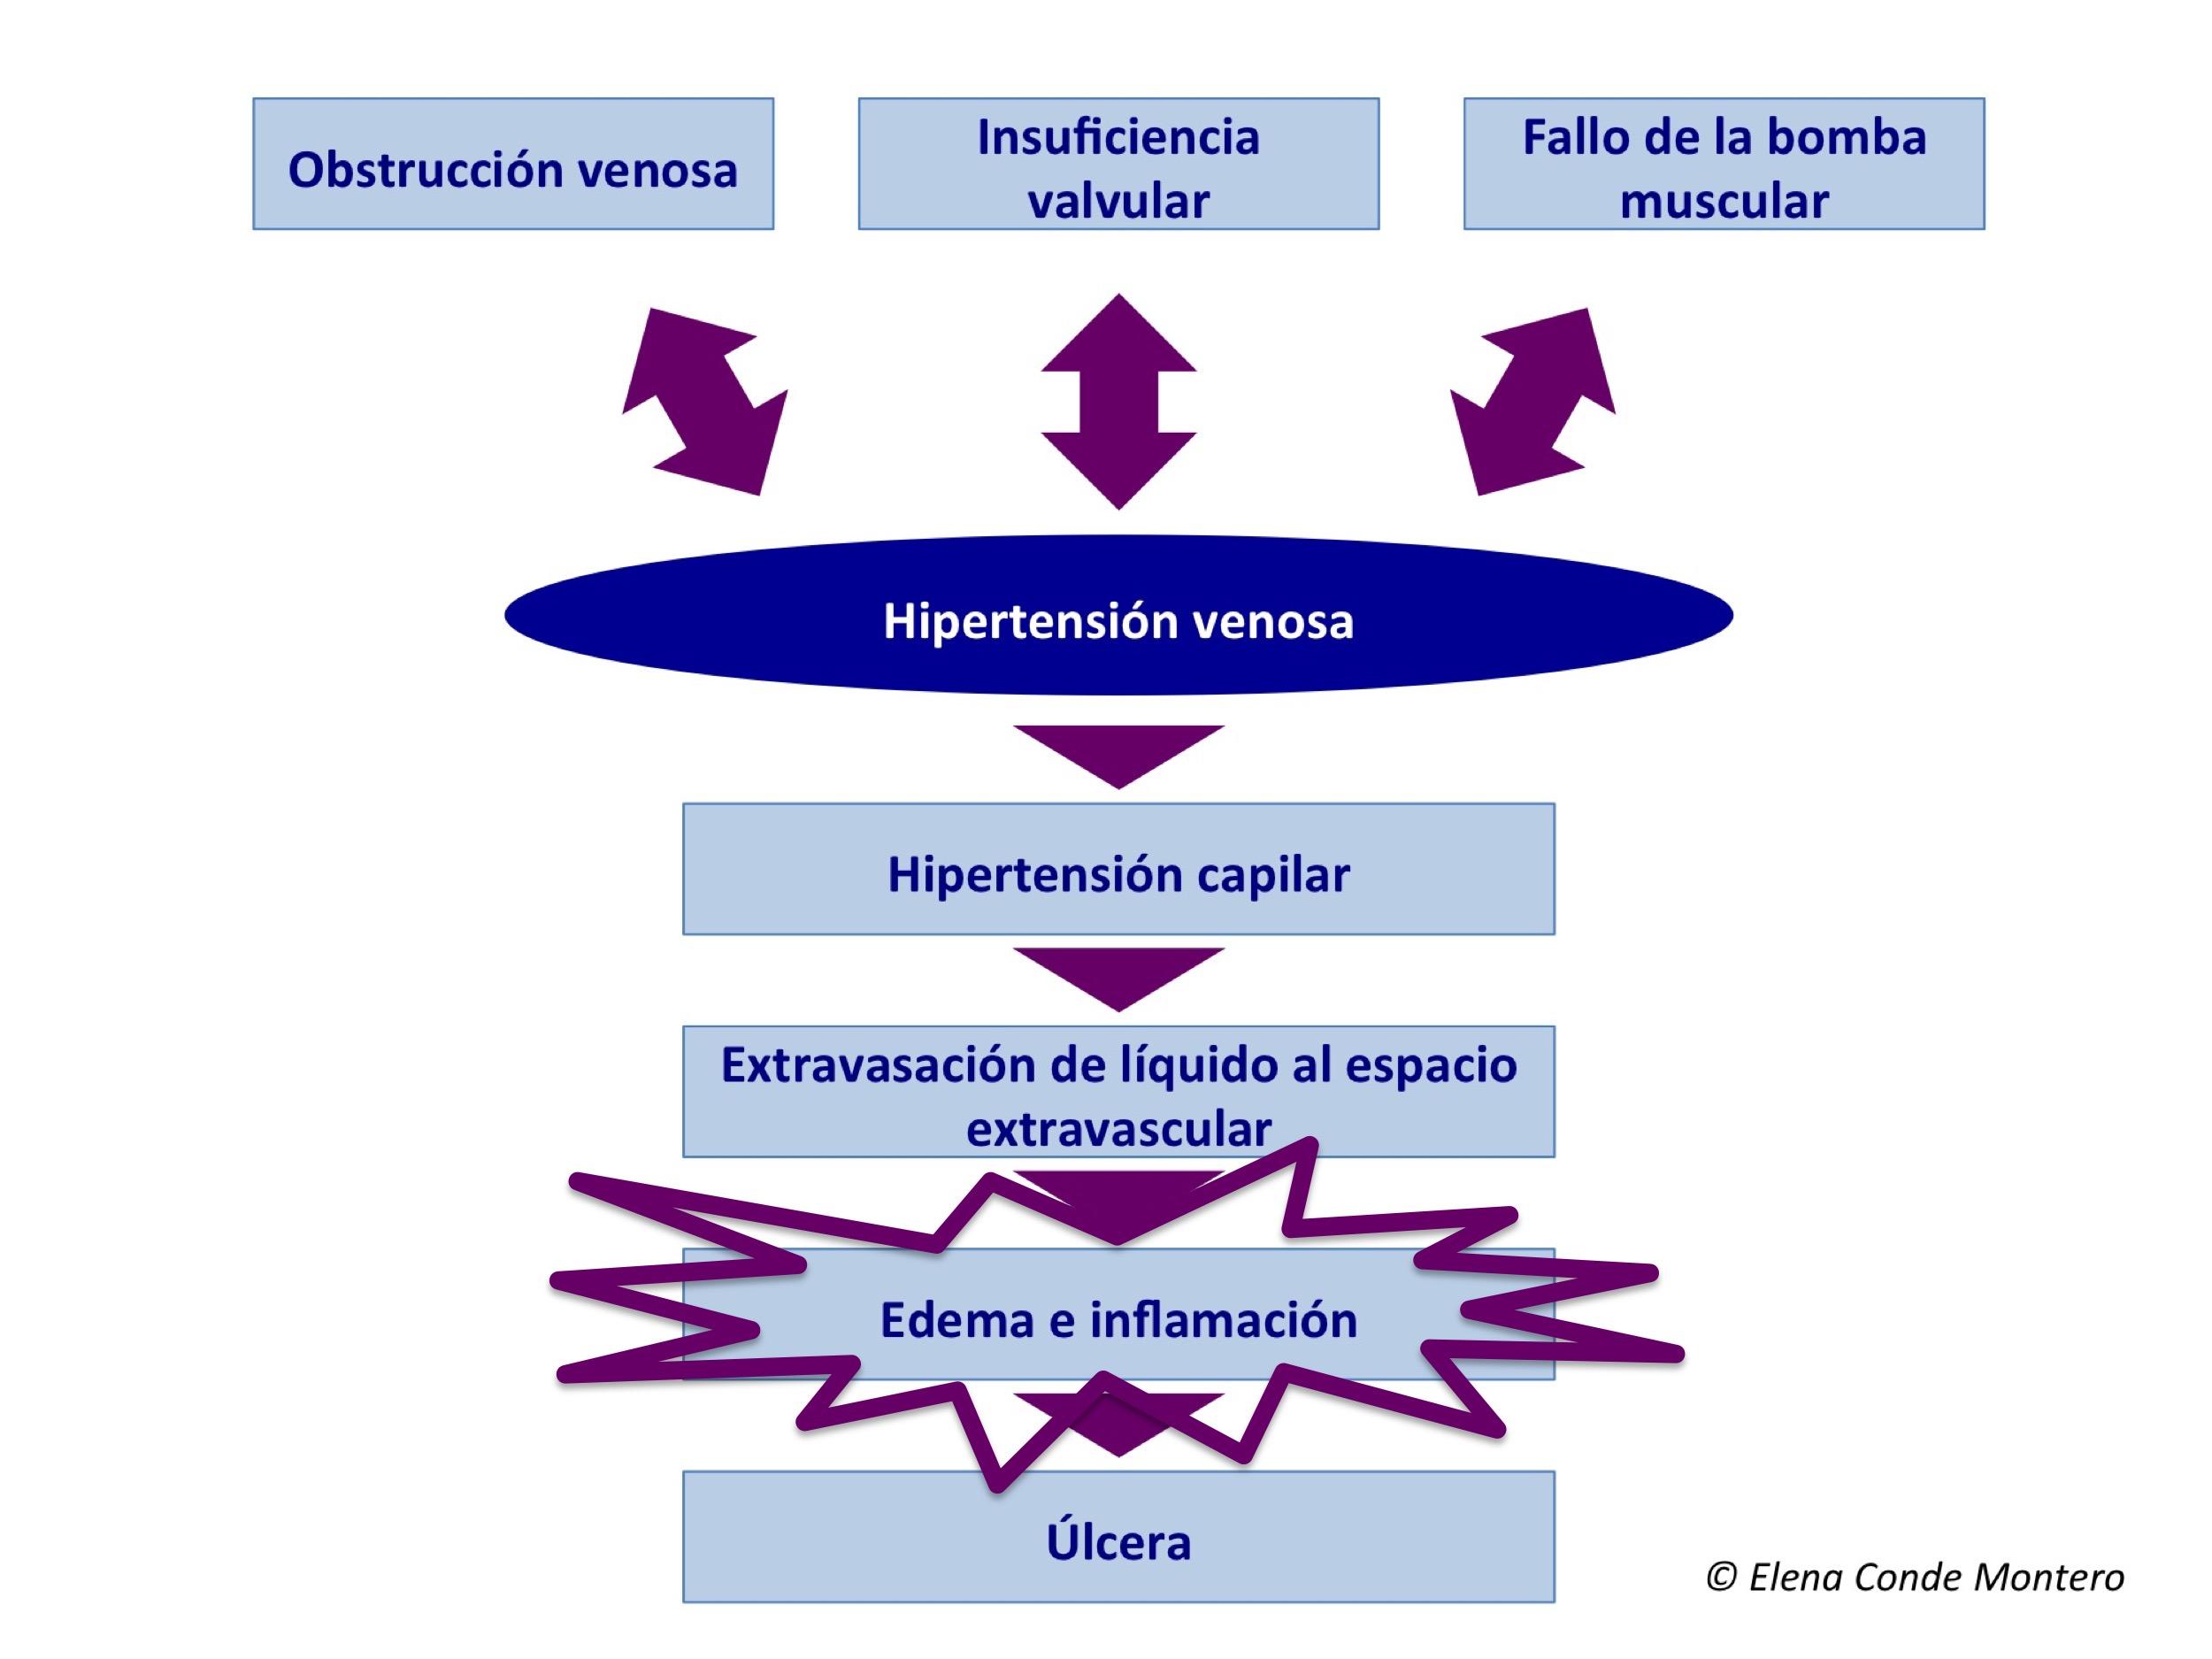 Definición de pacientes con hipertensión venosa